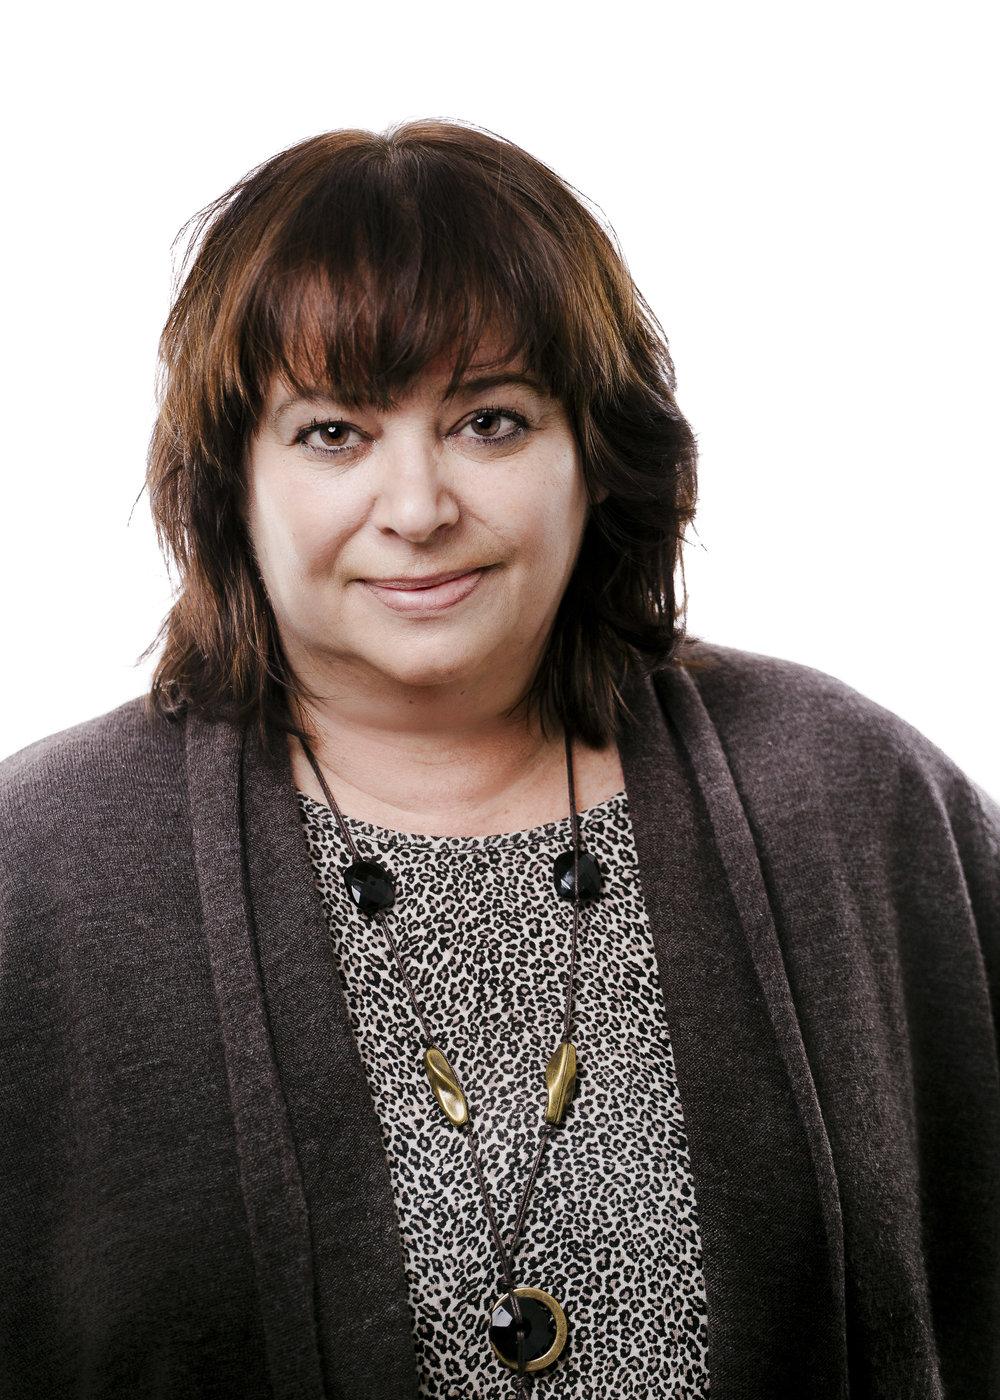 Christine Jahnke, Technician